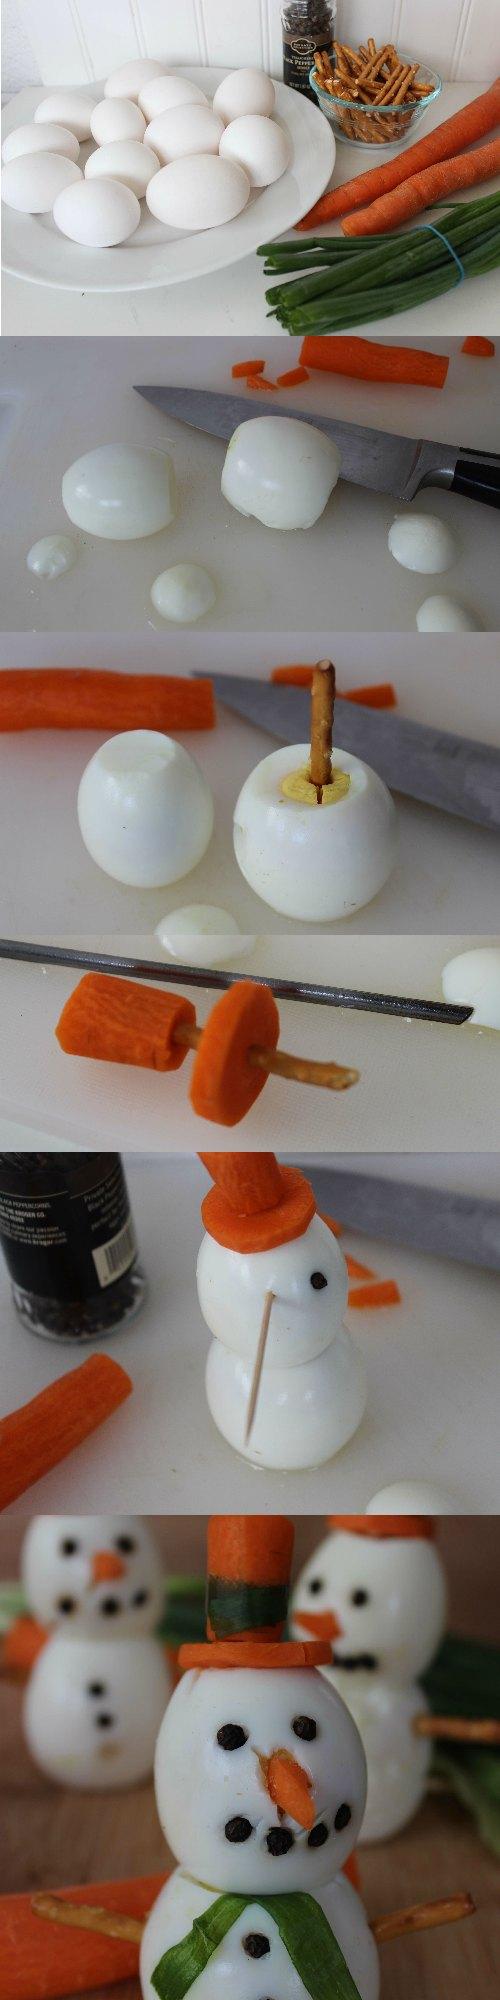 Creative Winter Healthy Snack - Boiled Egg Snowmen